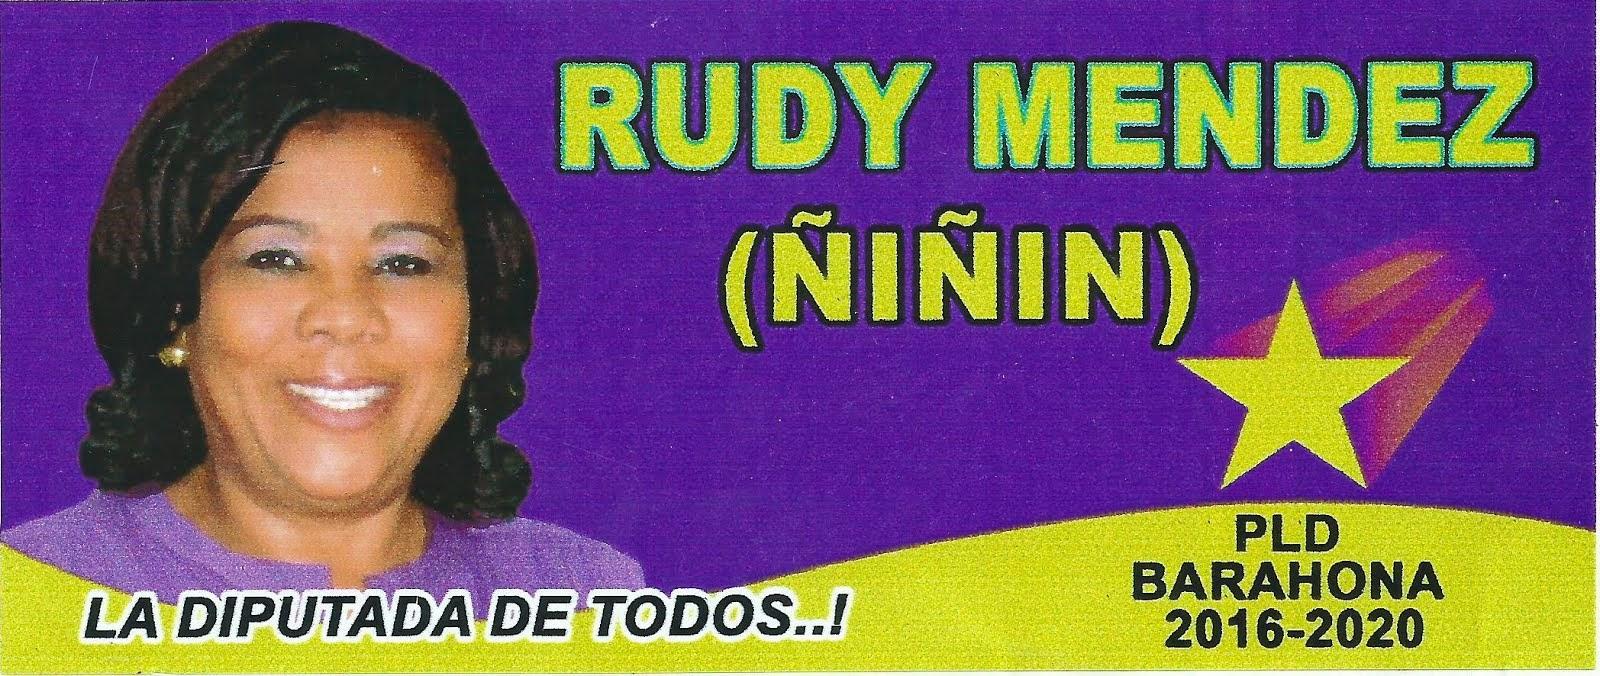 Rudy Mendez (Niñin)